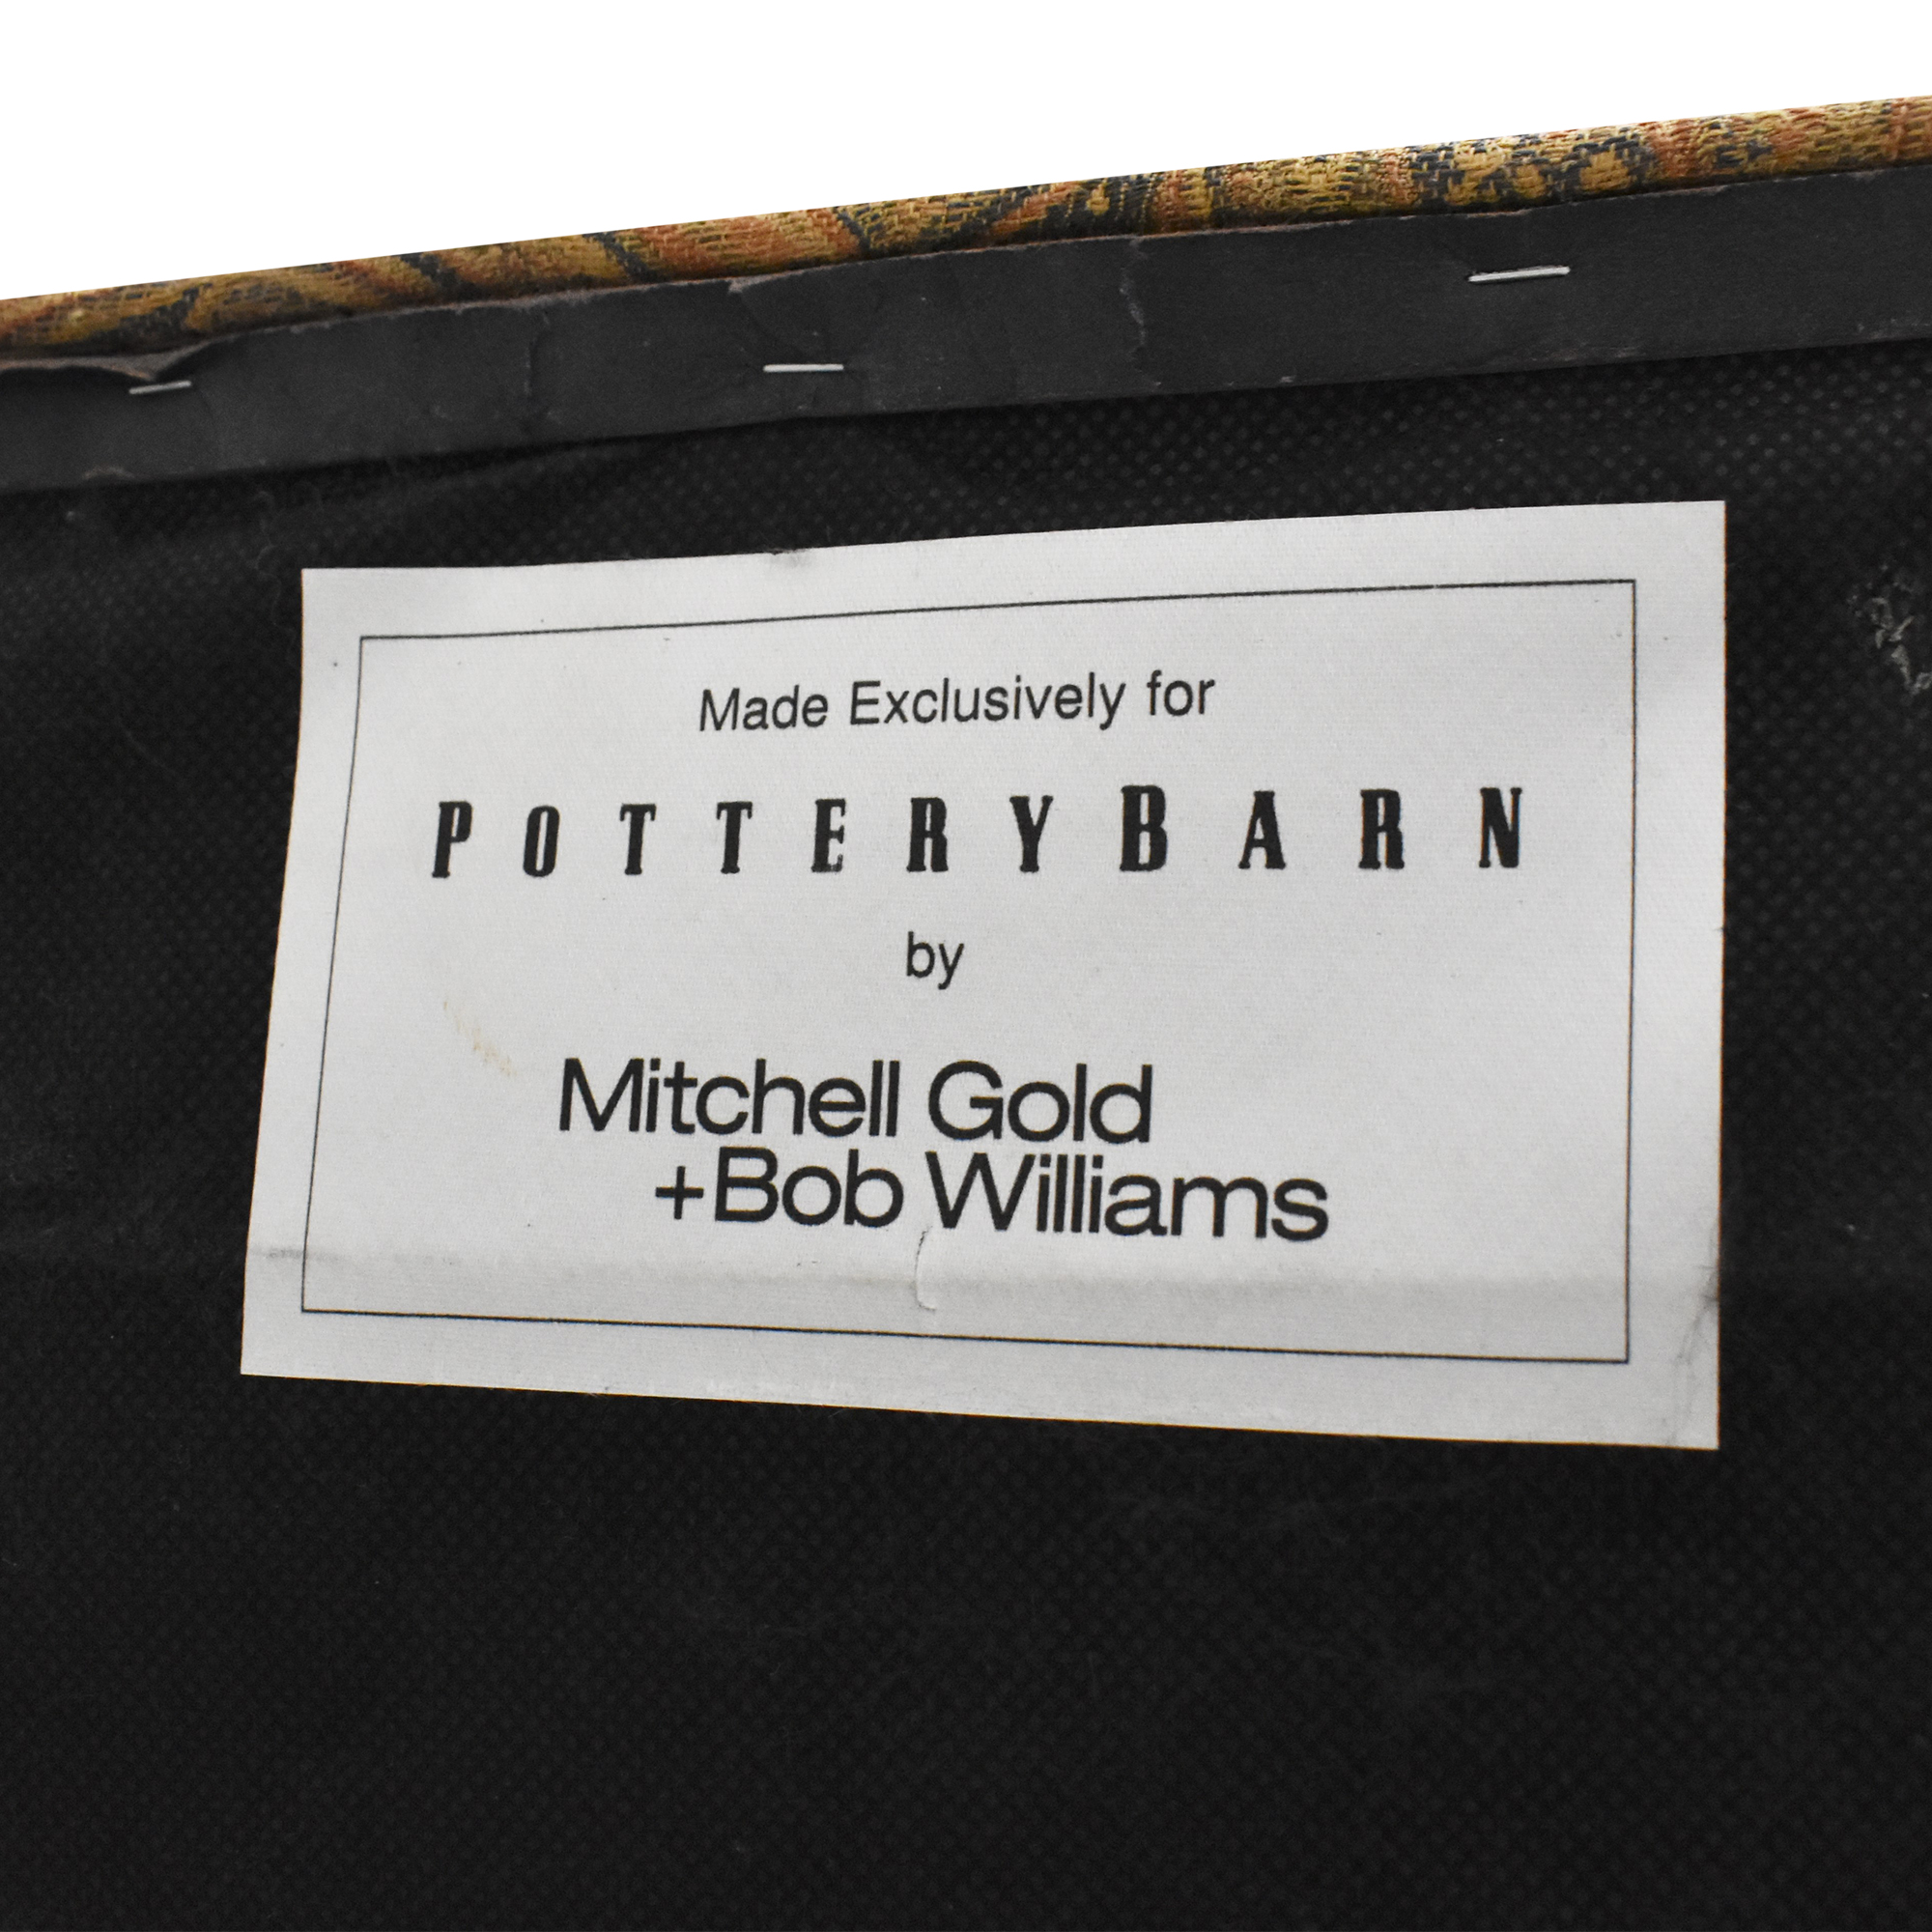 Pottery Barn Pottery Barn Tufted Paisley Ottoman by Mitchell Gold + Bob Williams ct